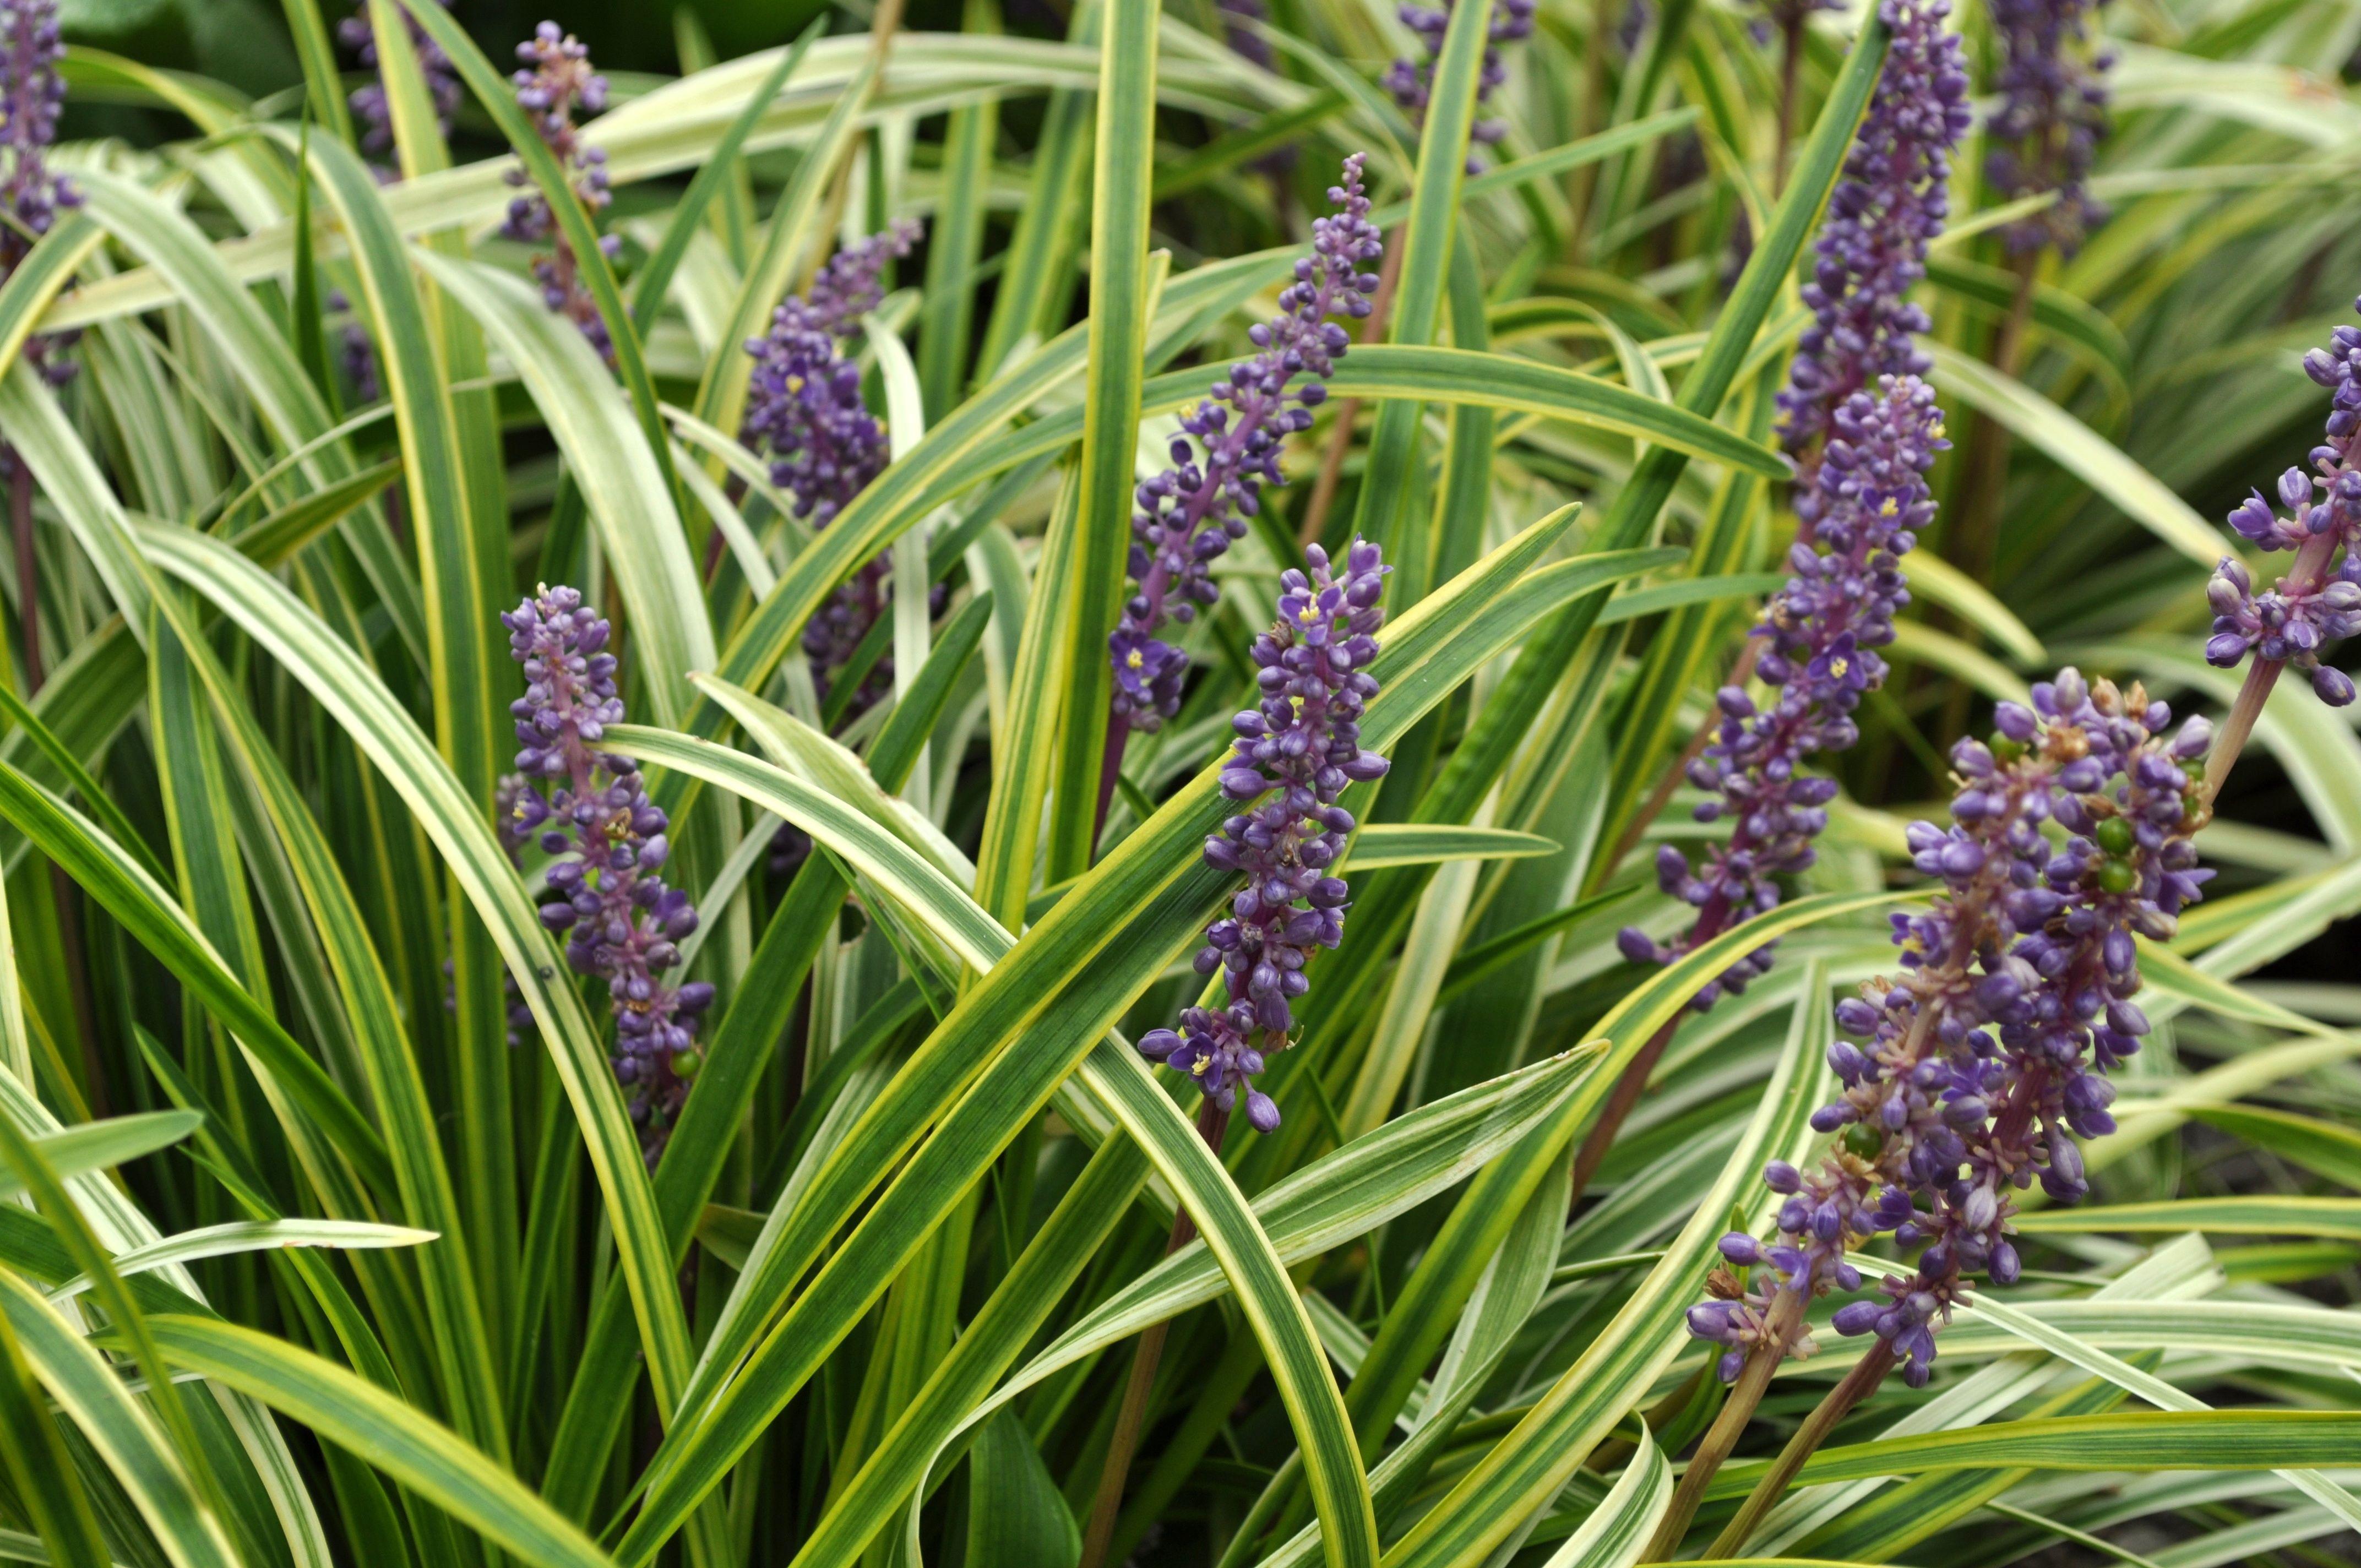 Liriope muscari 'Variegata' Common name Lilyturf Part to